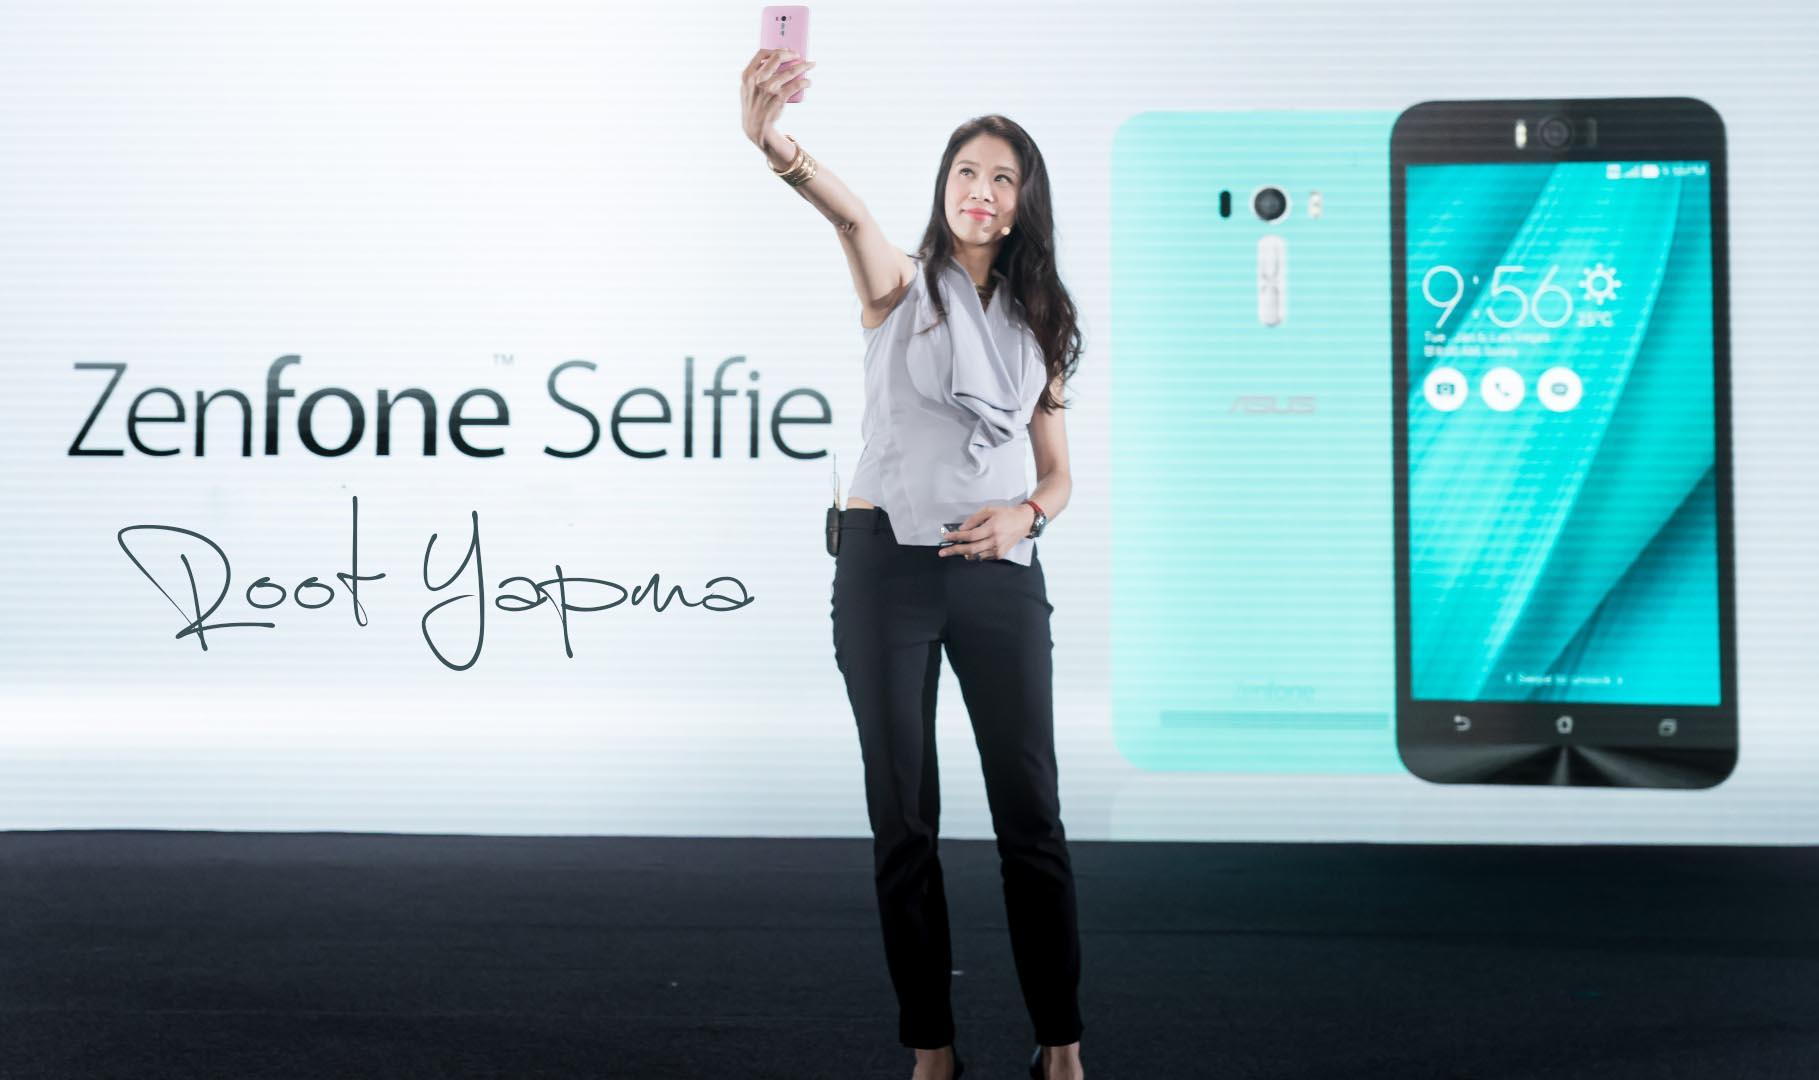 Asus Zenfone Selfie Kolay Root Yapma zenfone selfie root yapma zenfone selfie root rehberi zenfone selfie kolay root zenfone selfie easy root kolay root asus zenfone selfie root yapma android makale